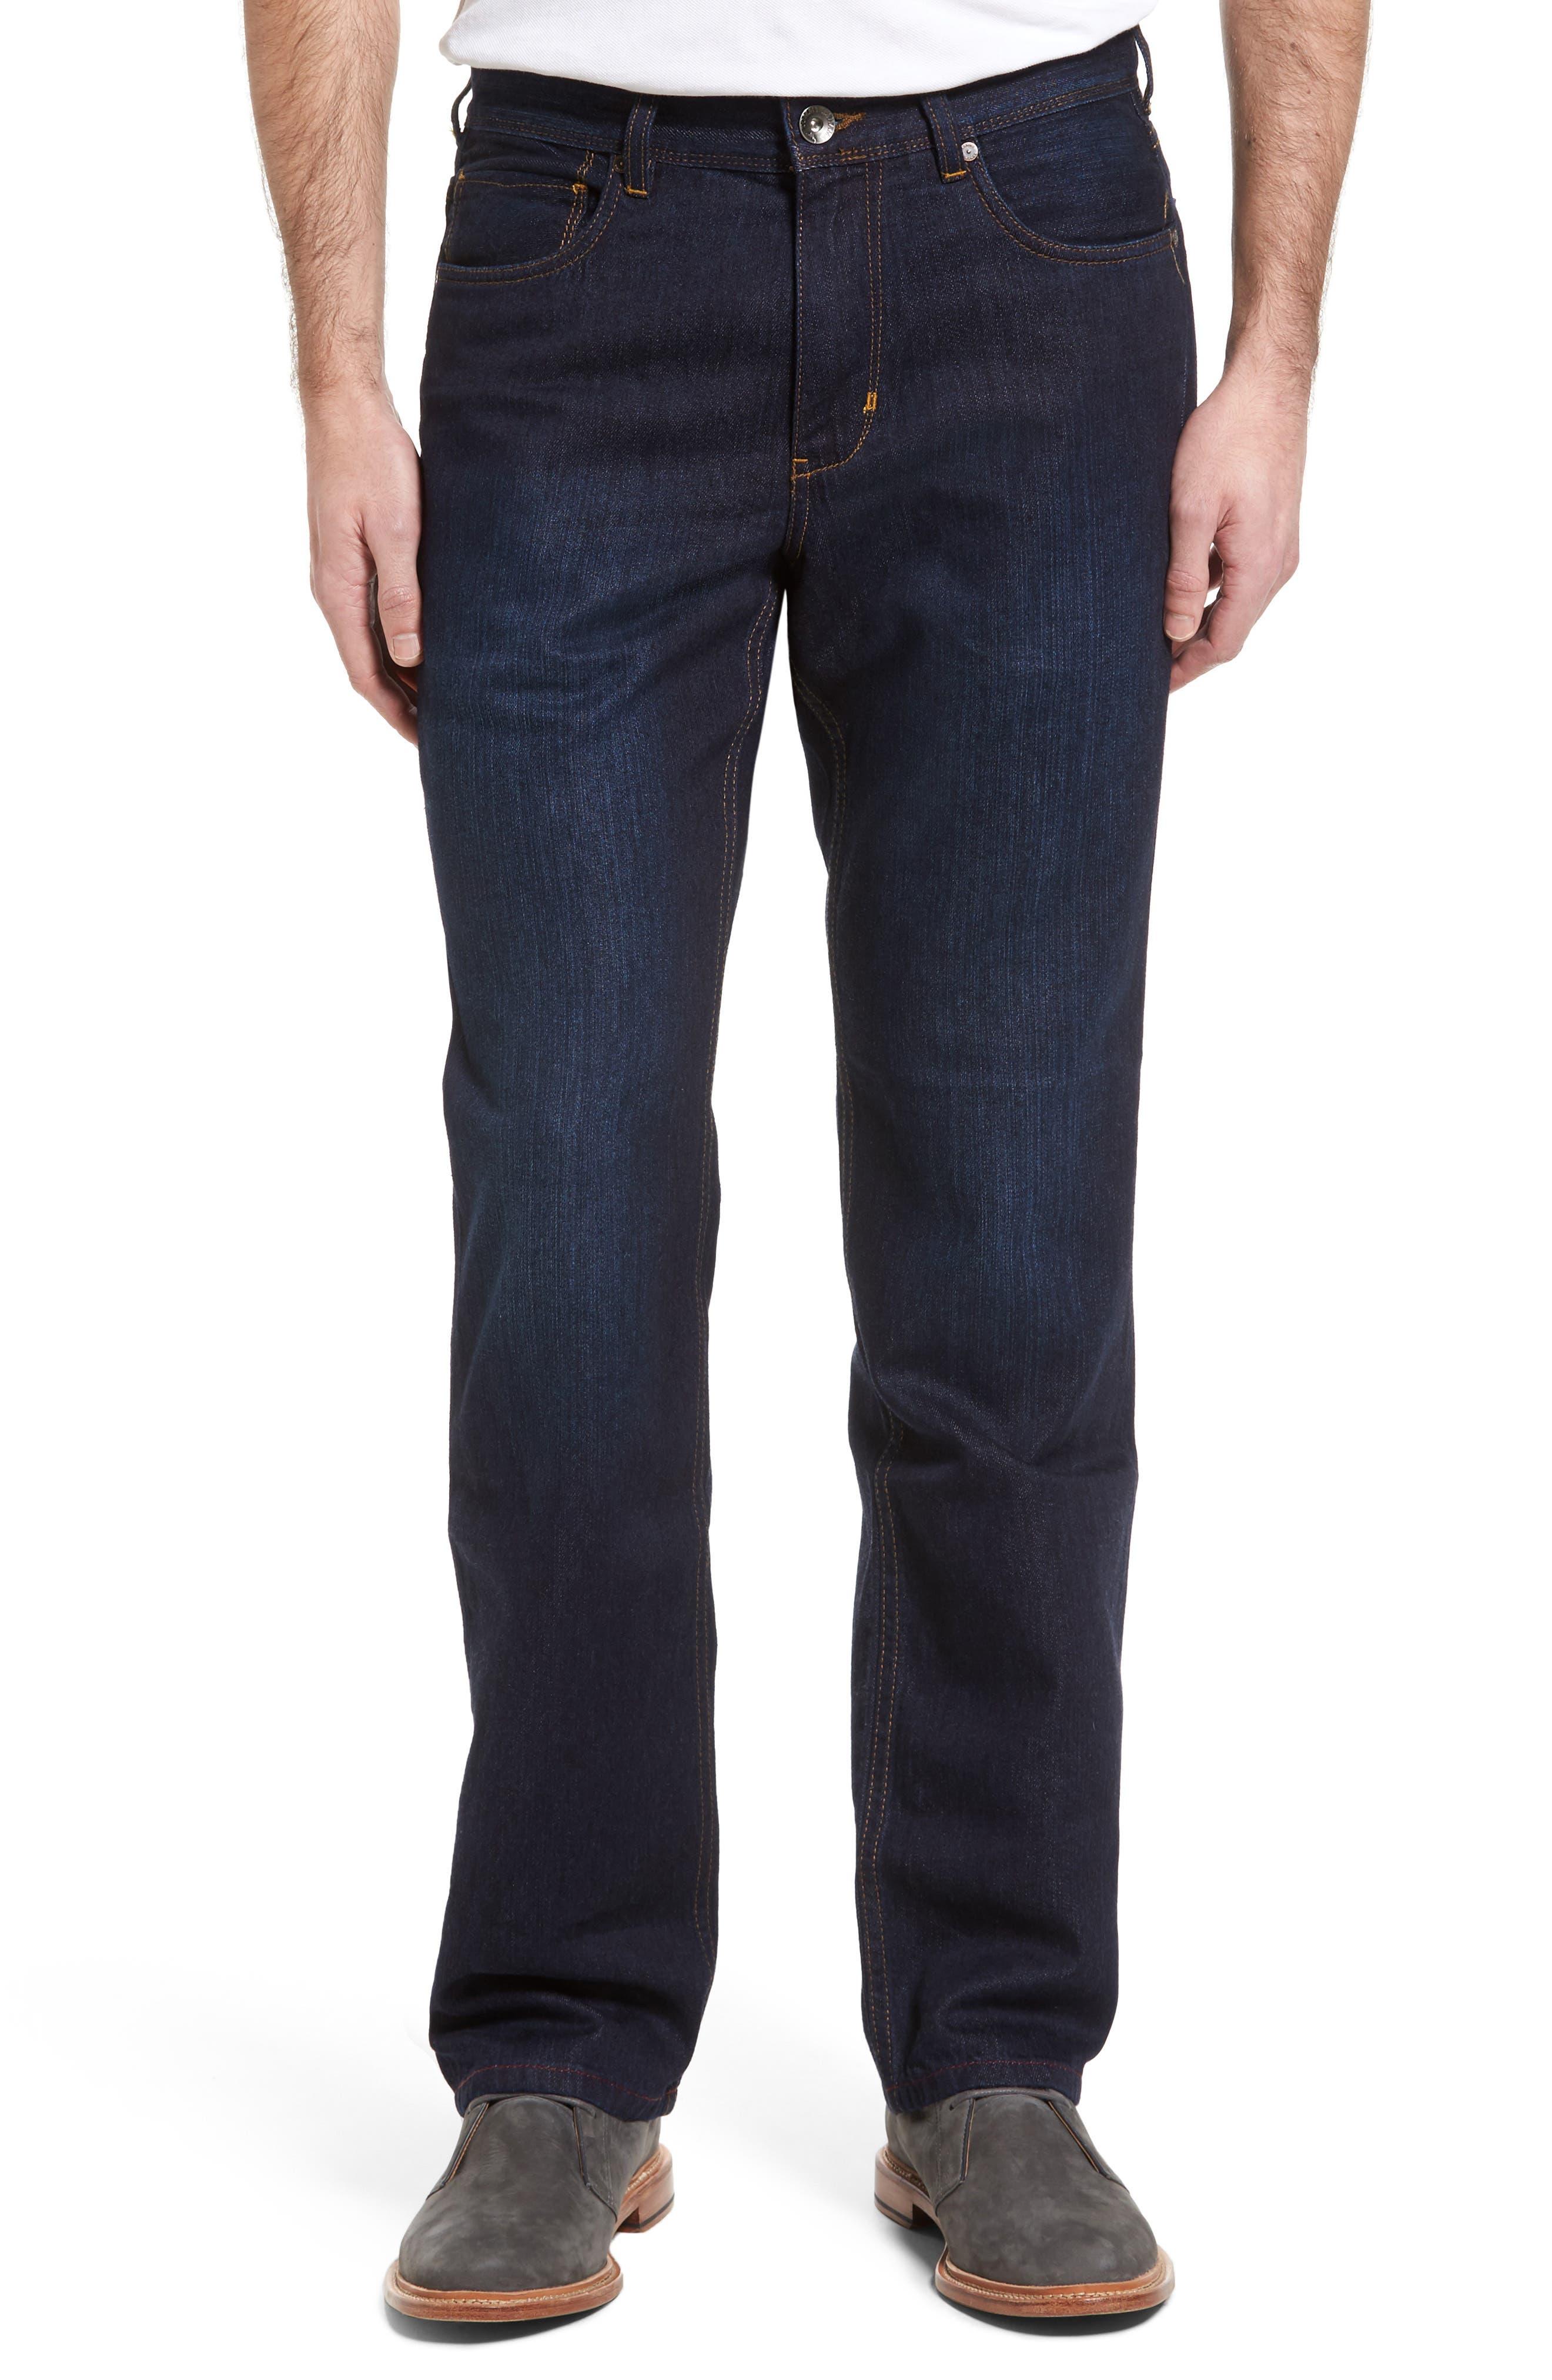 Tommy Bahama Cayman Straight Leg Jeans (Beach Wash)